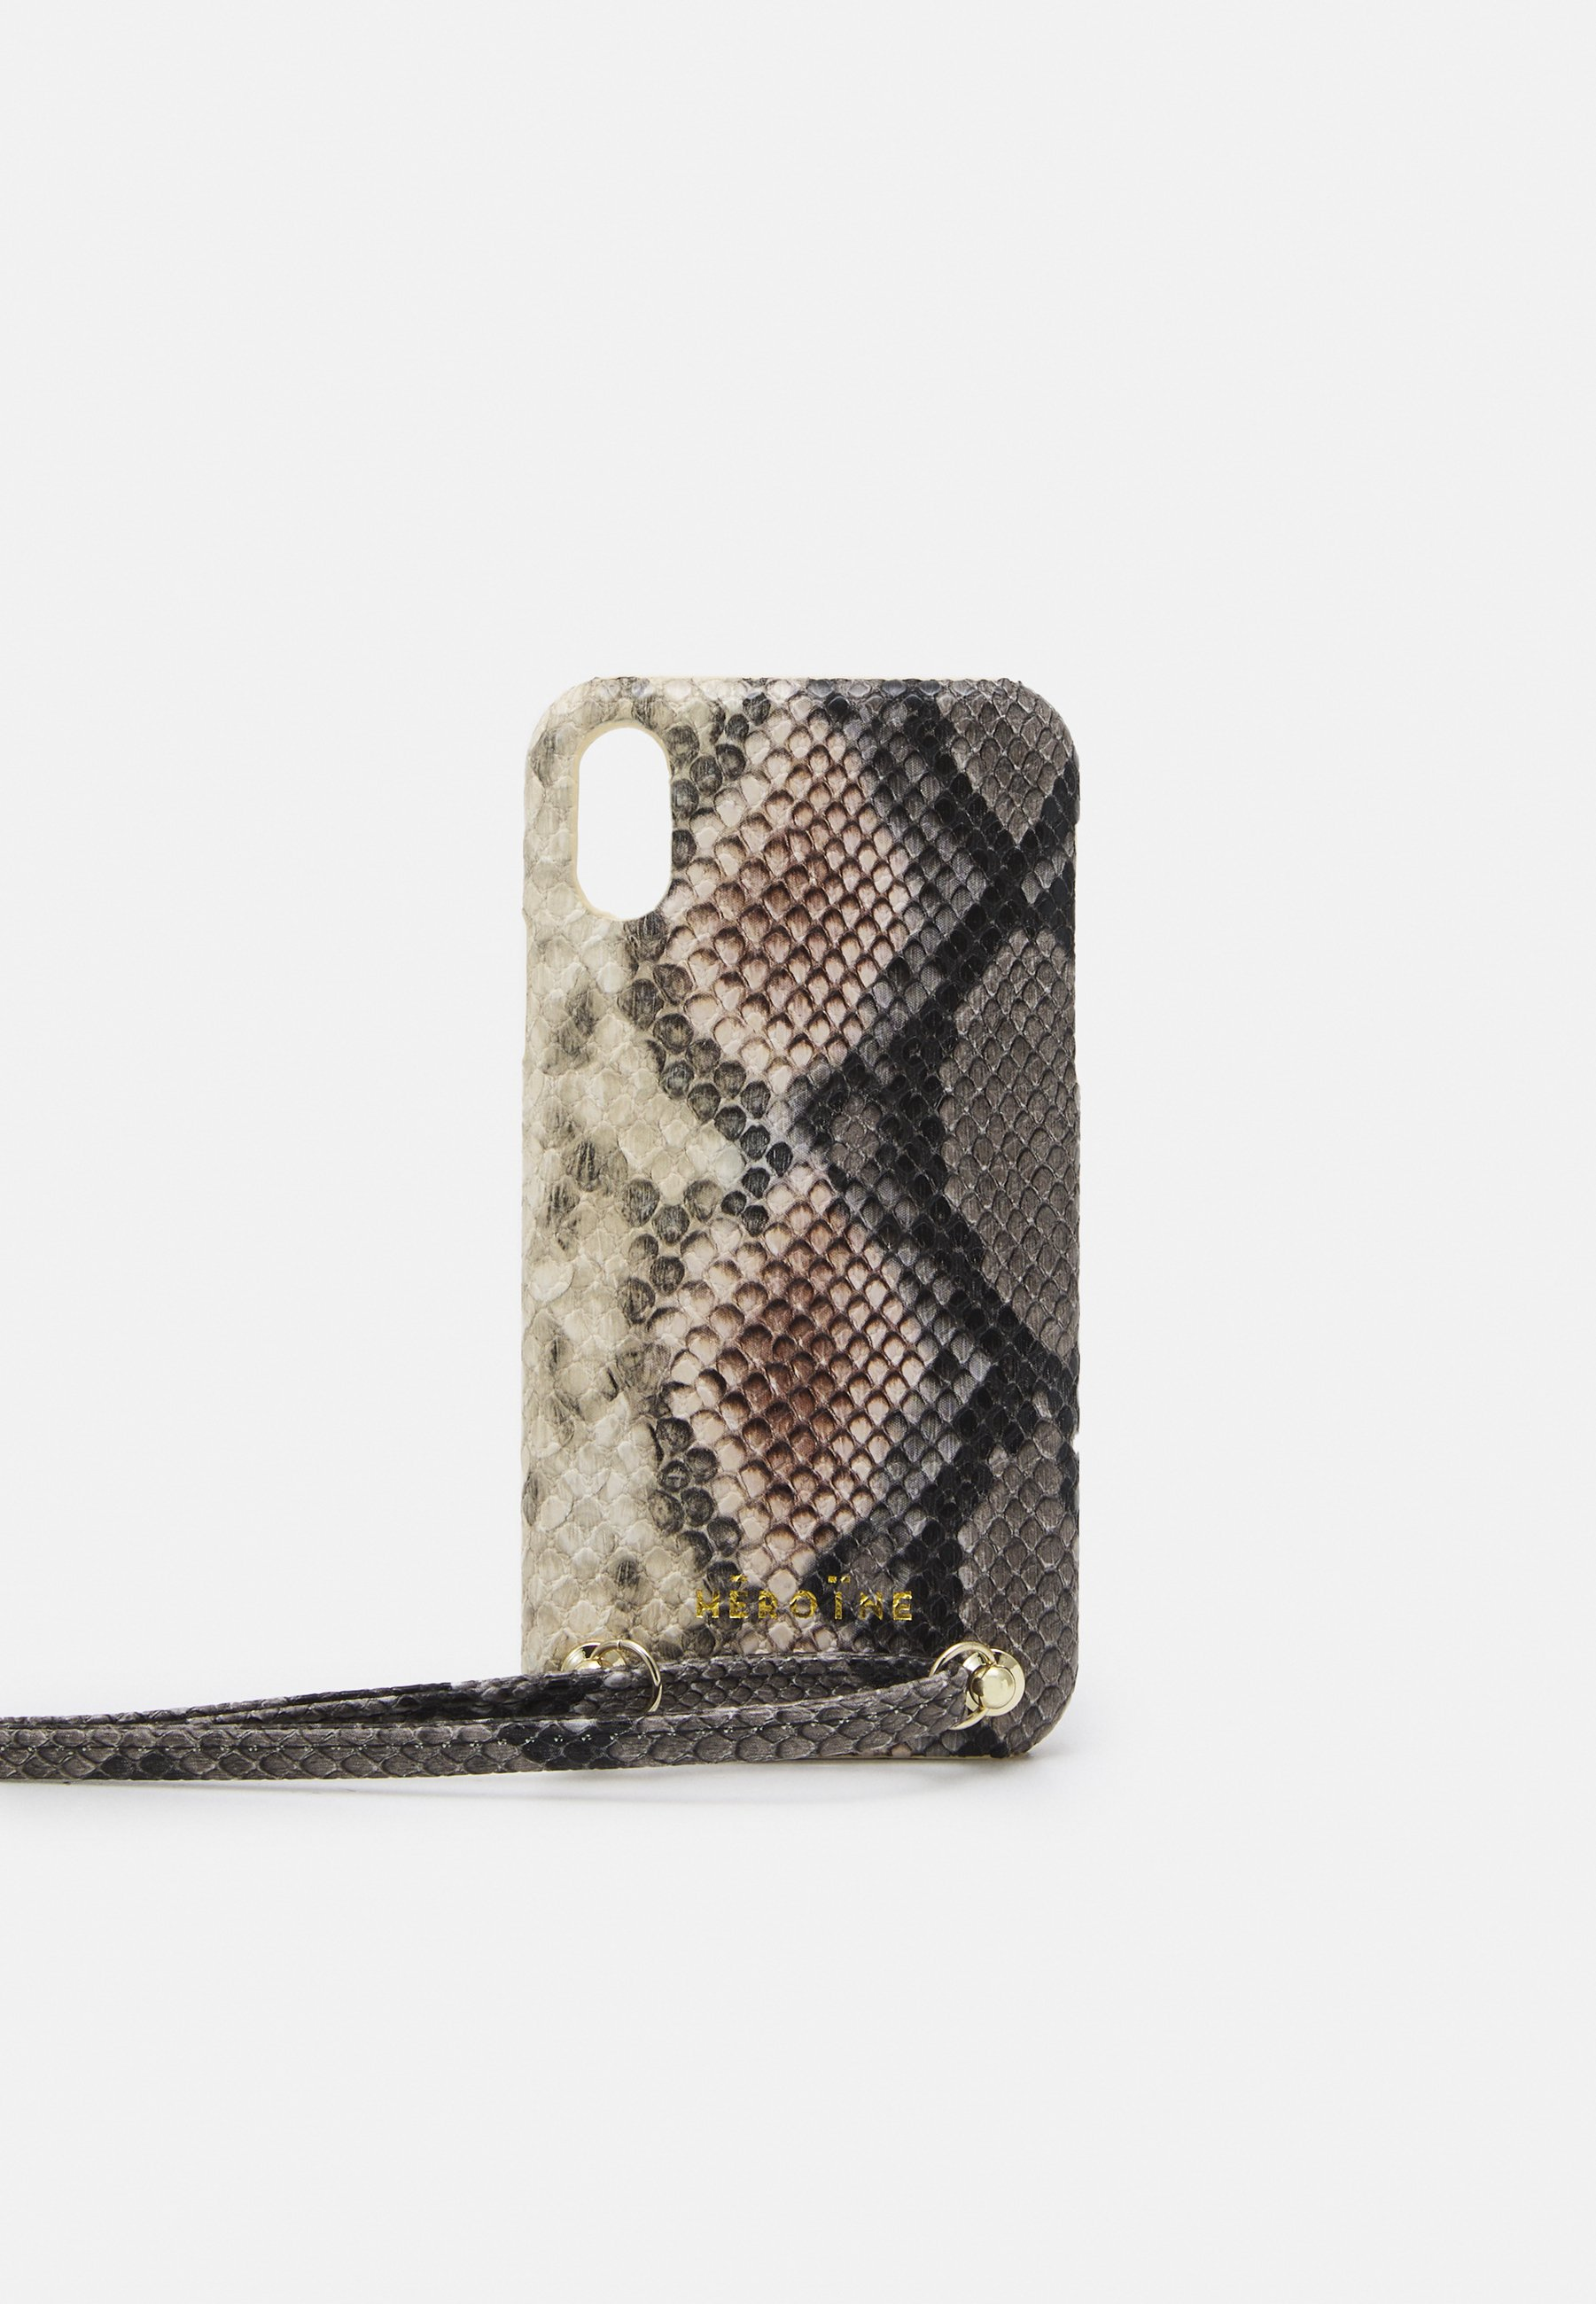 Femme YUNA IPHONE XR HANDYKETTE NECKLACE - Étui à portable - snake rose/grey